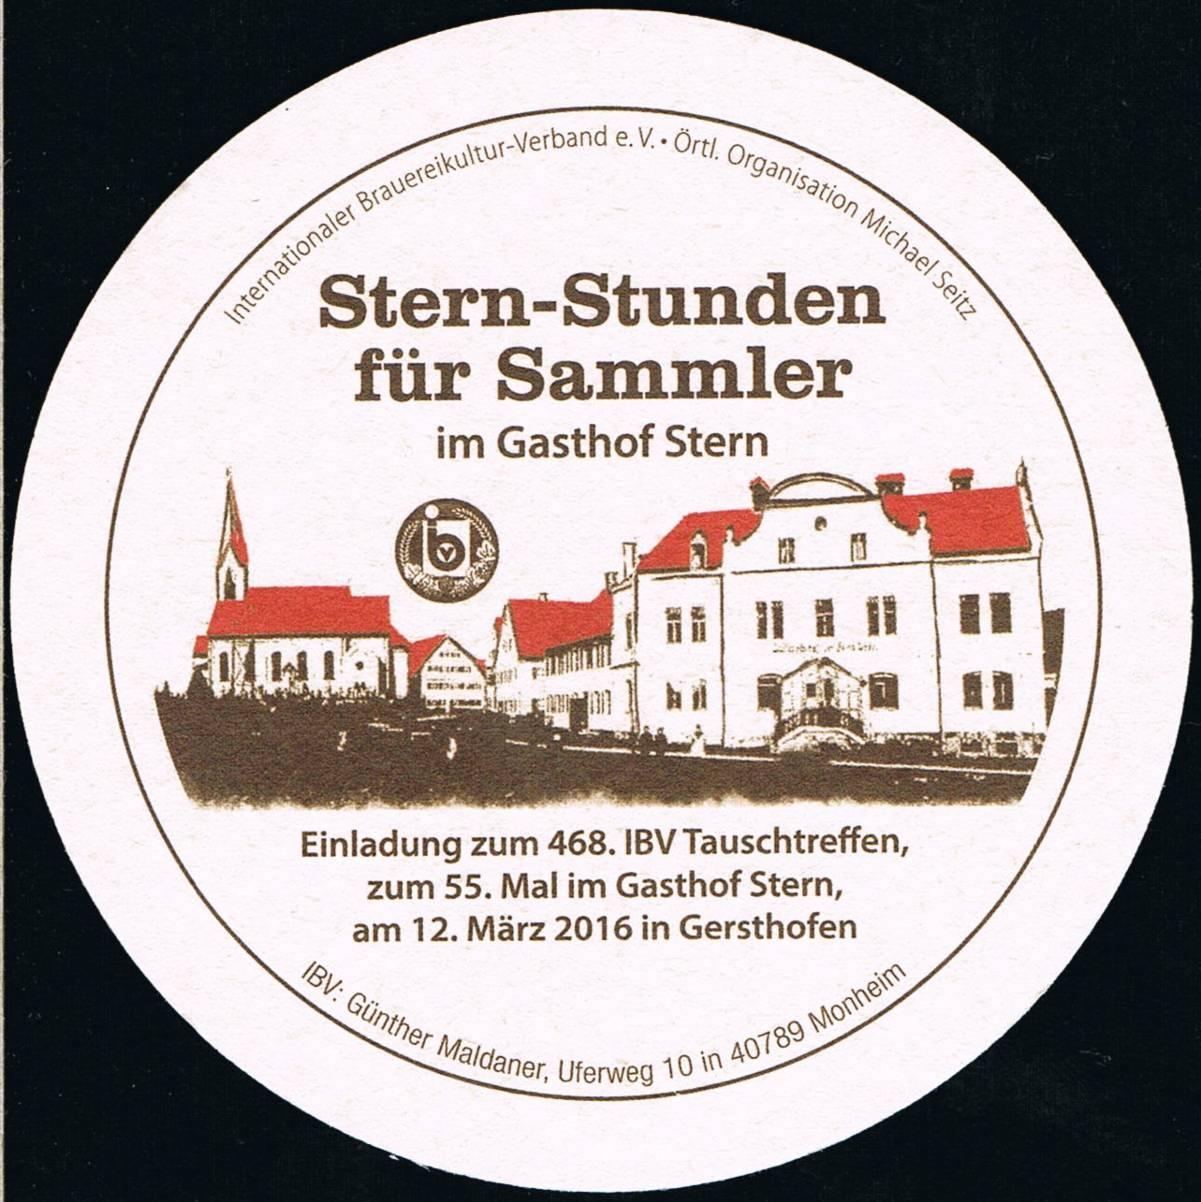 Internationaler Brauereikultur-Verband e.V. - 2016